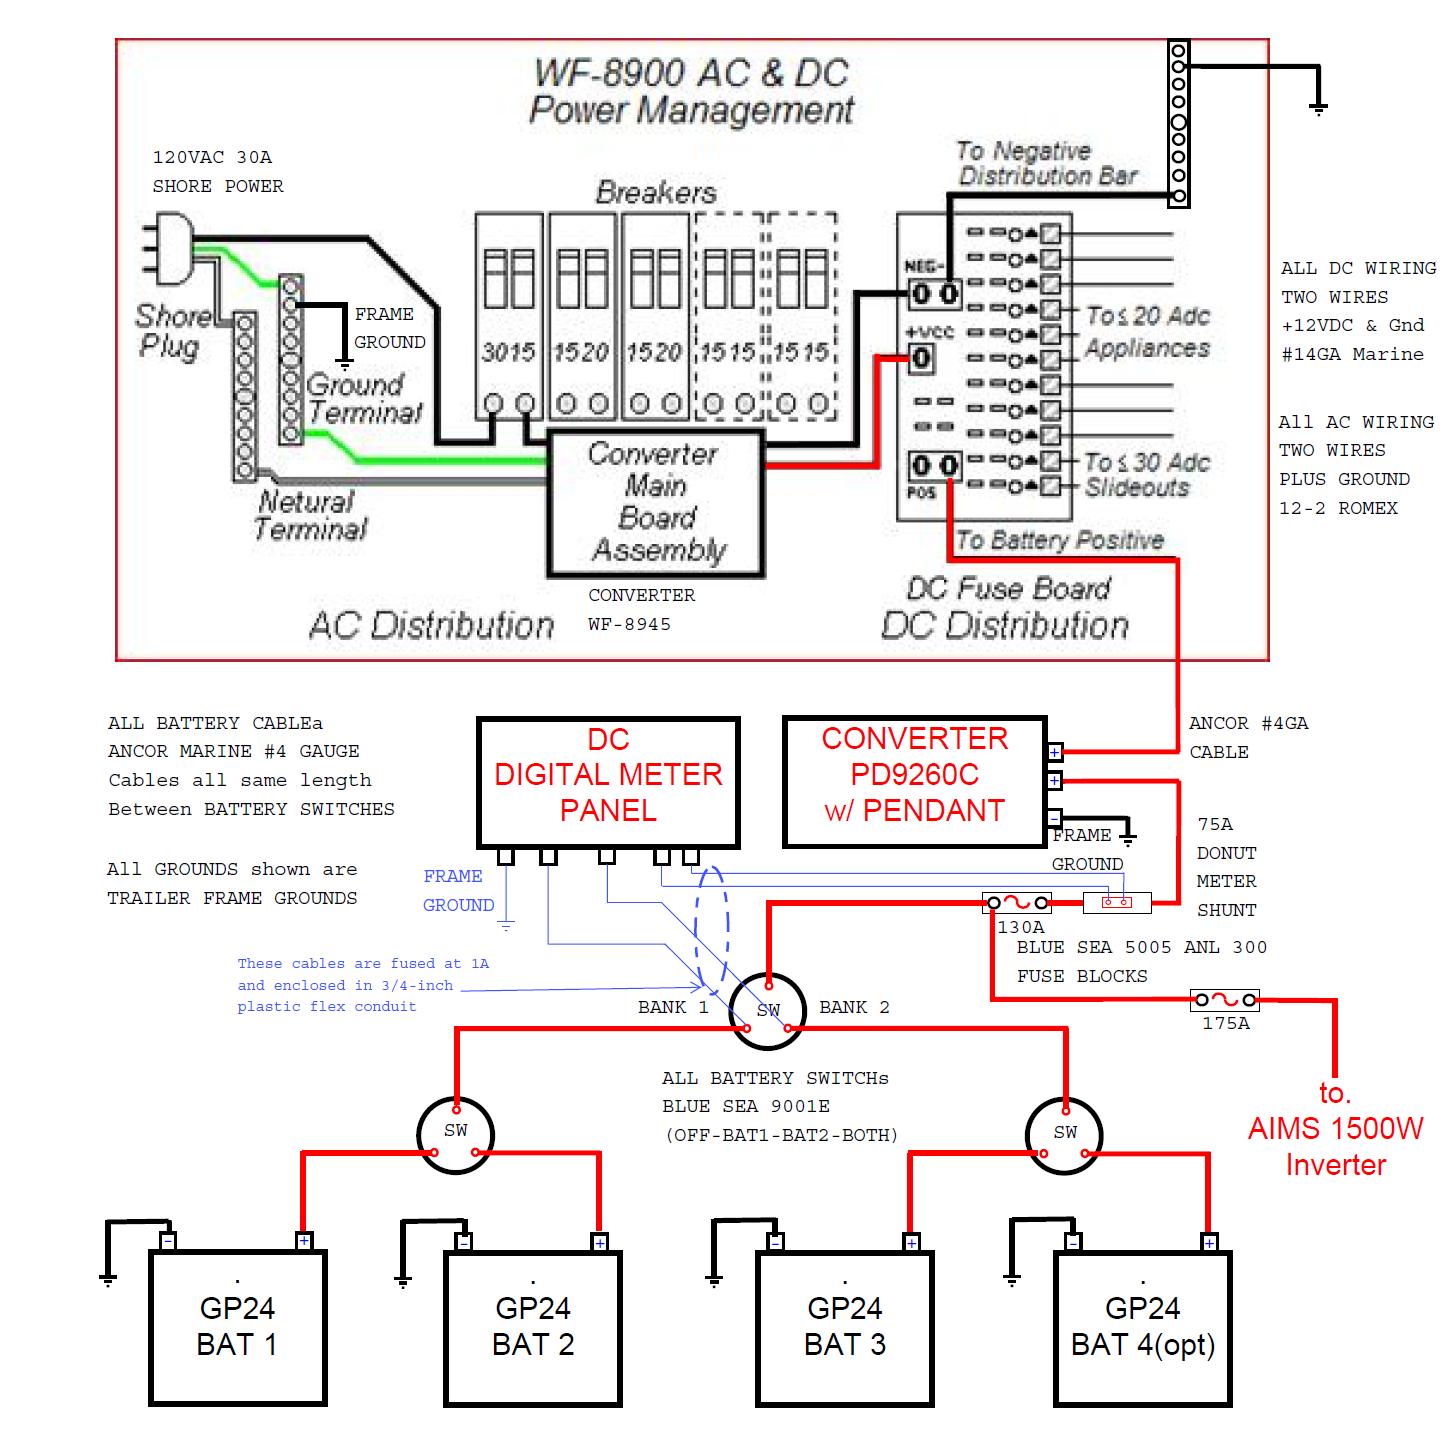 Wiring Diagram Troubleshooting Schematic Rv Power Converter Within - Rv Power Converter Wiring Diagram